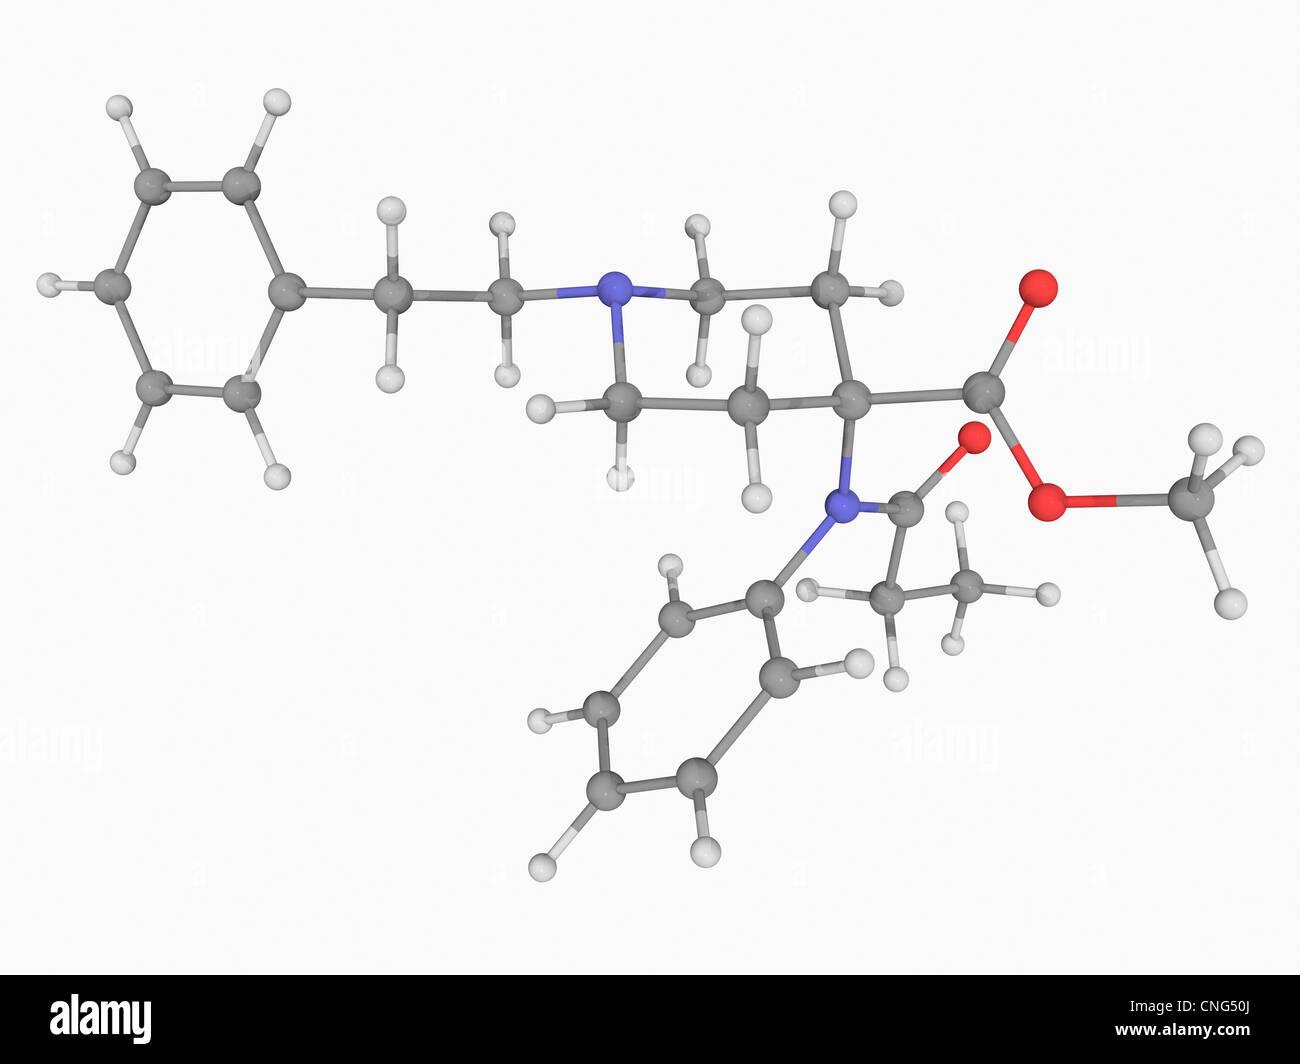 Carfentanil drug molecule - Stock Image